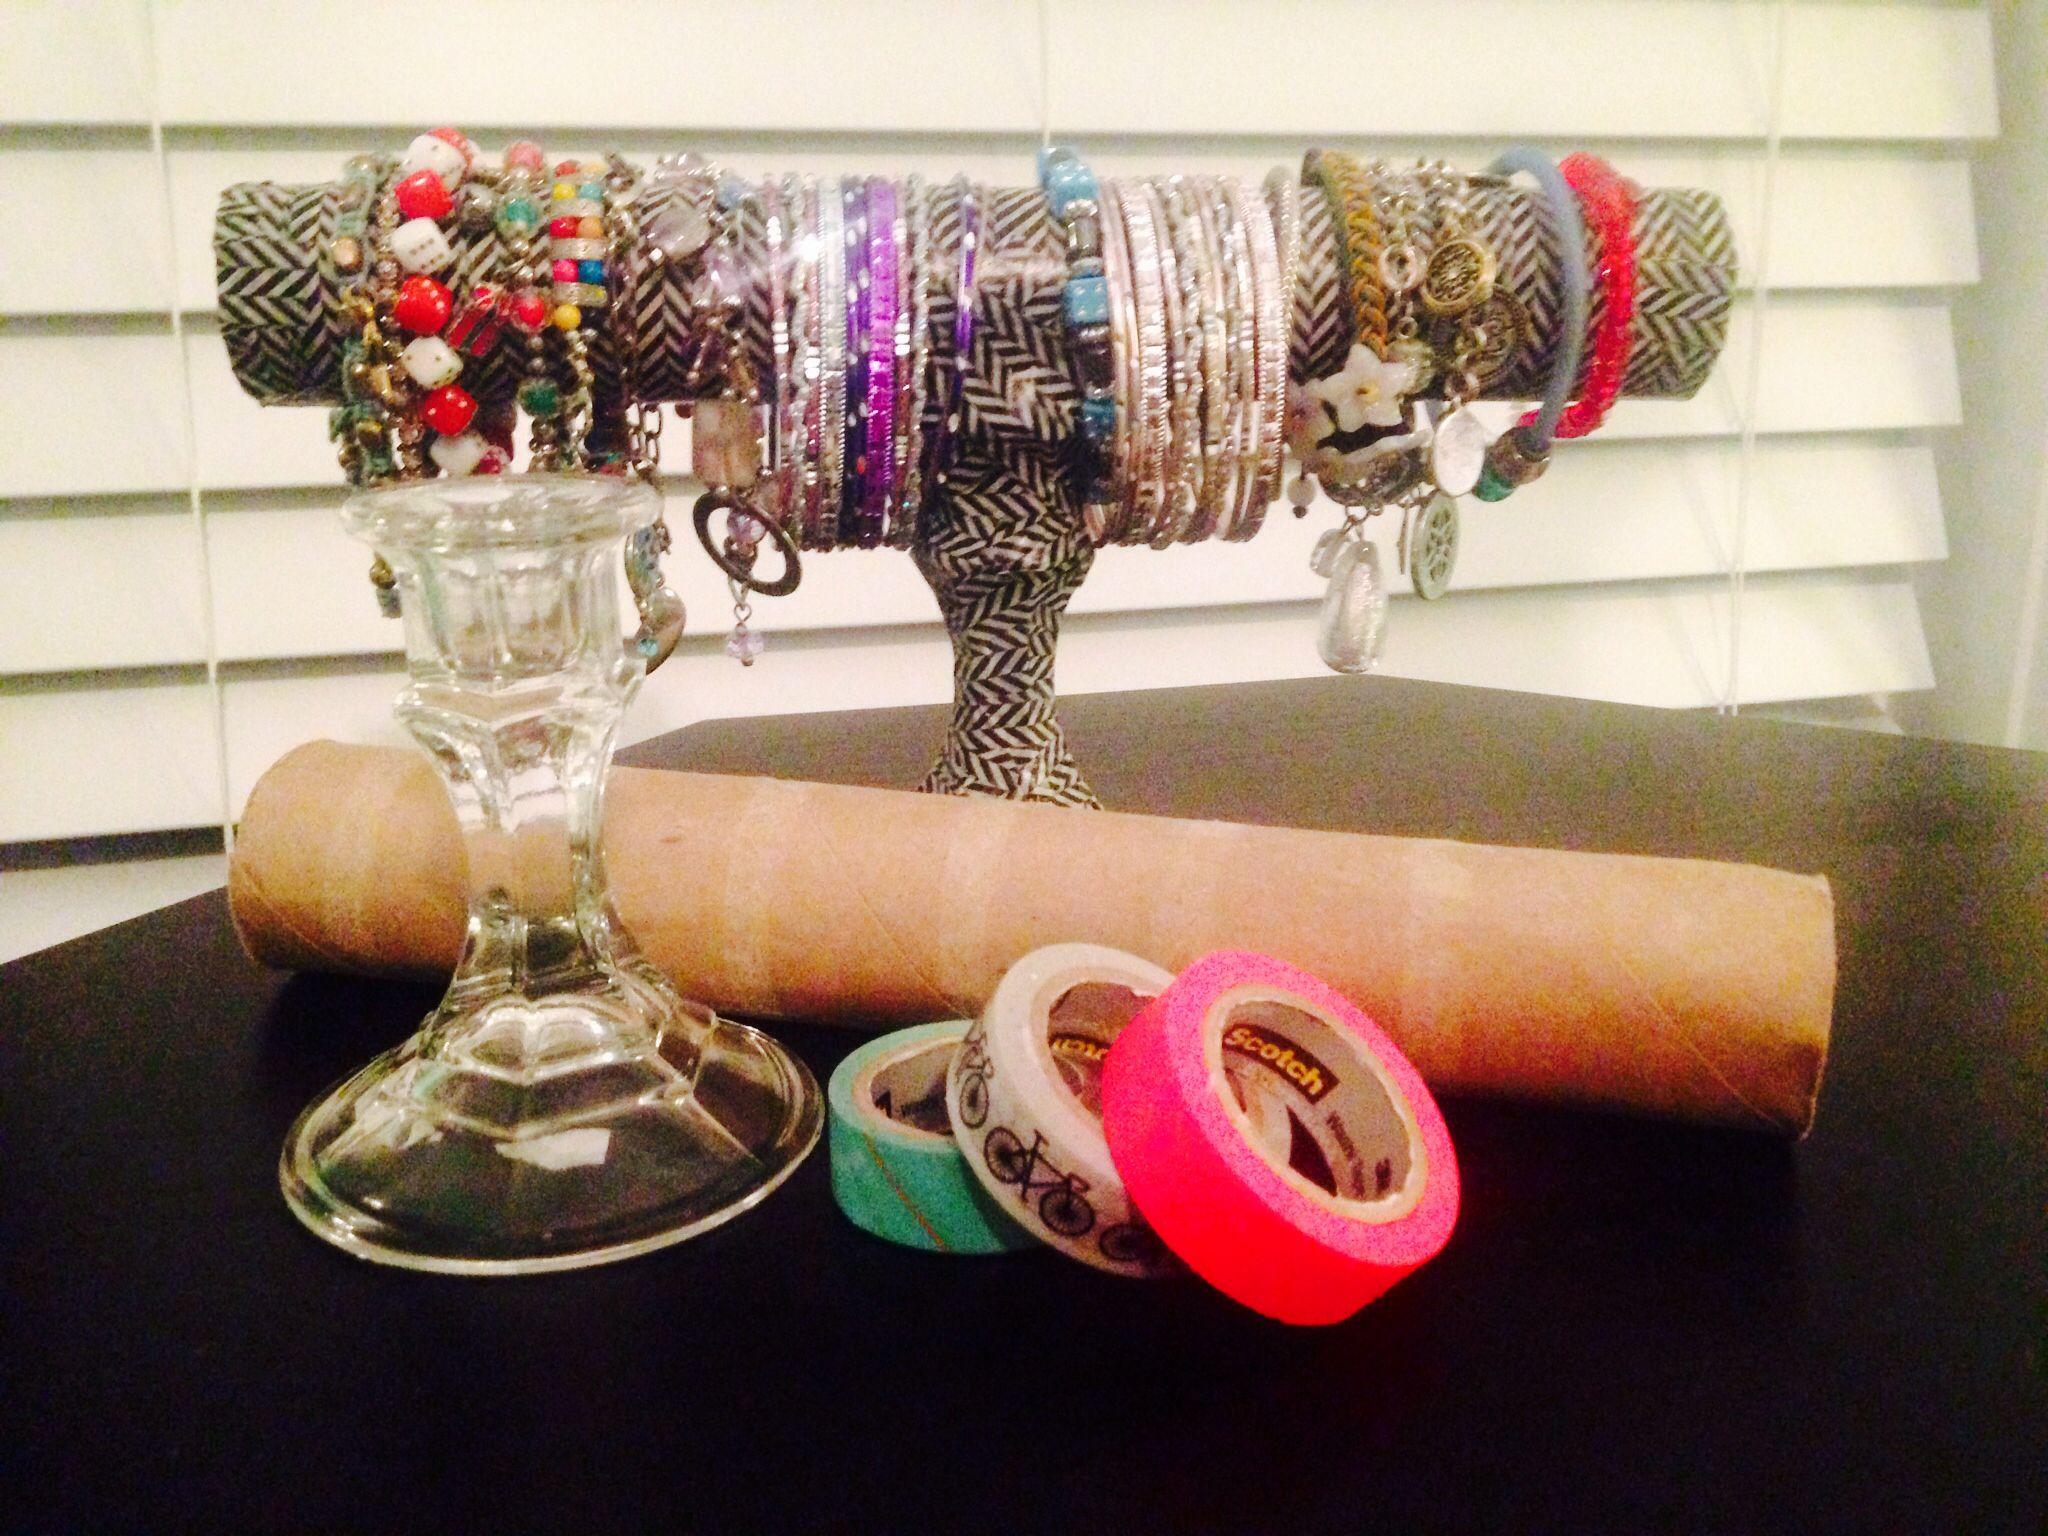 Diy bracelet holder buy a candle holder from dollar tree